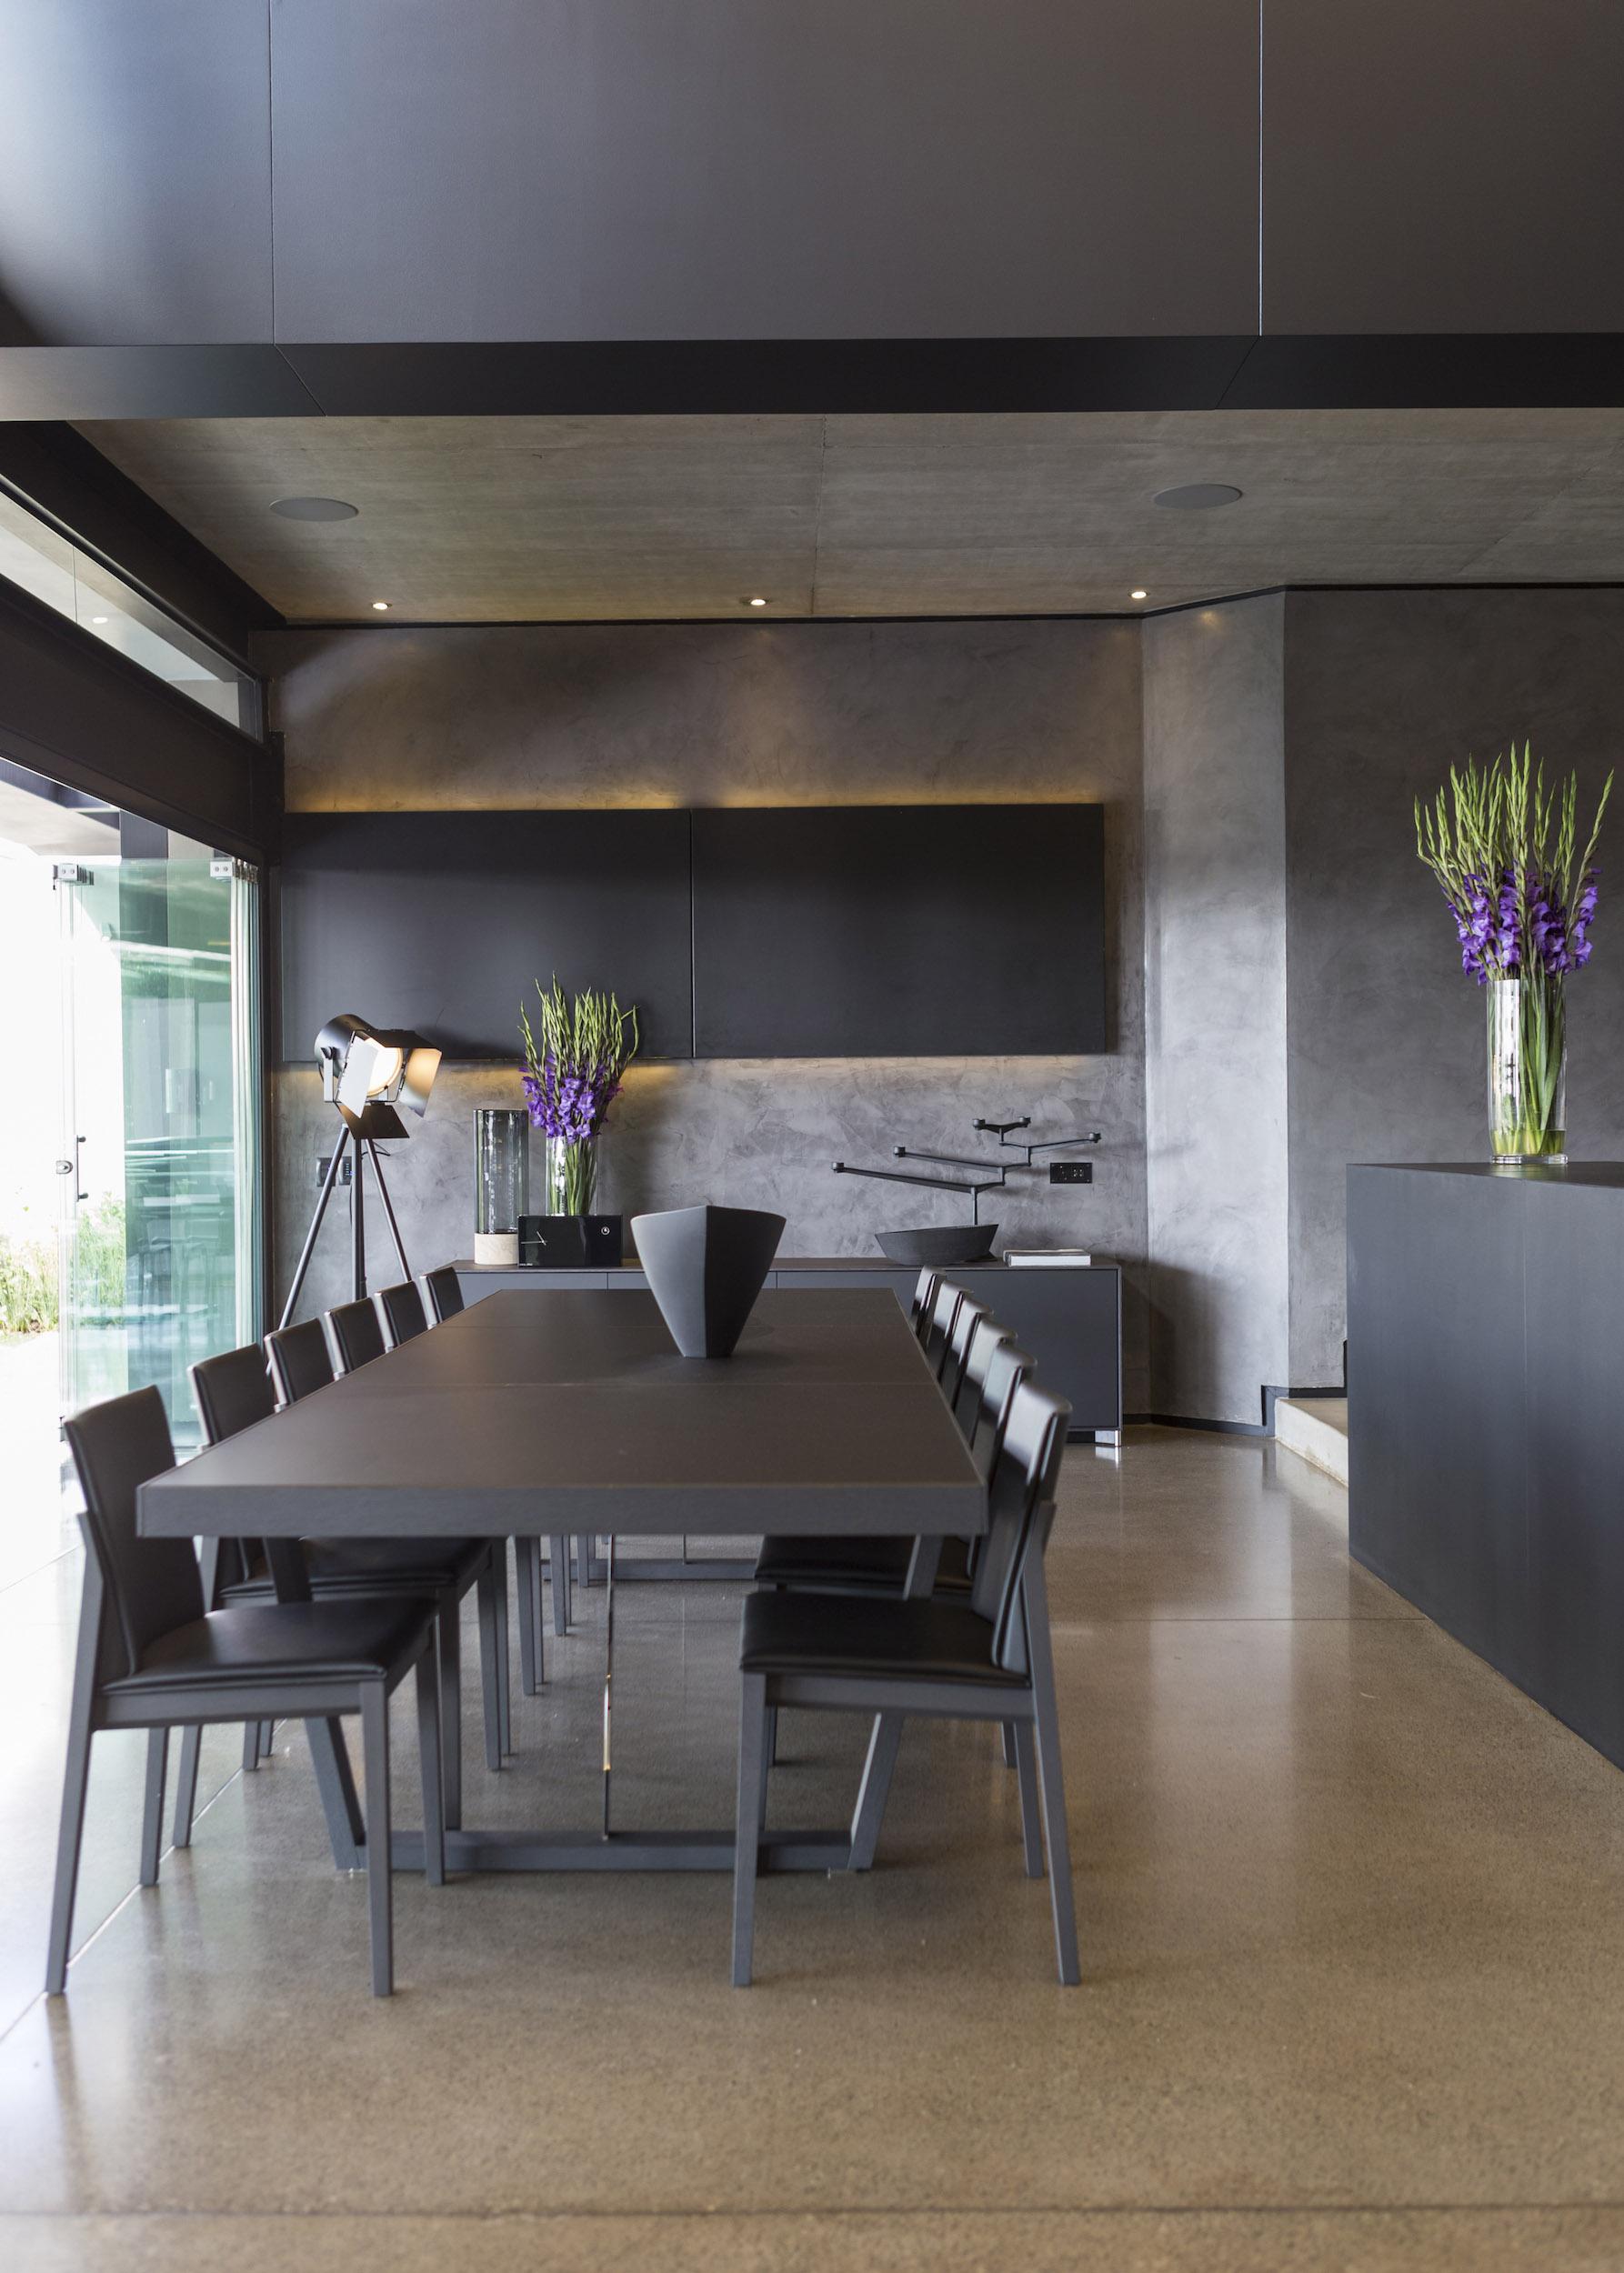 Kloof Road Masterpiece House in Johannesburg by Nico van der Meulen Architects-20